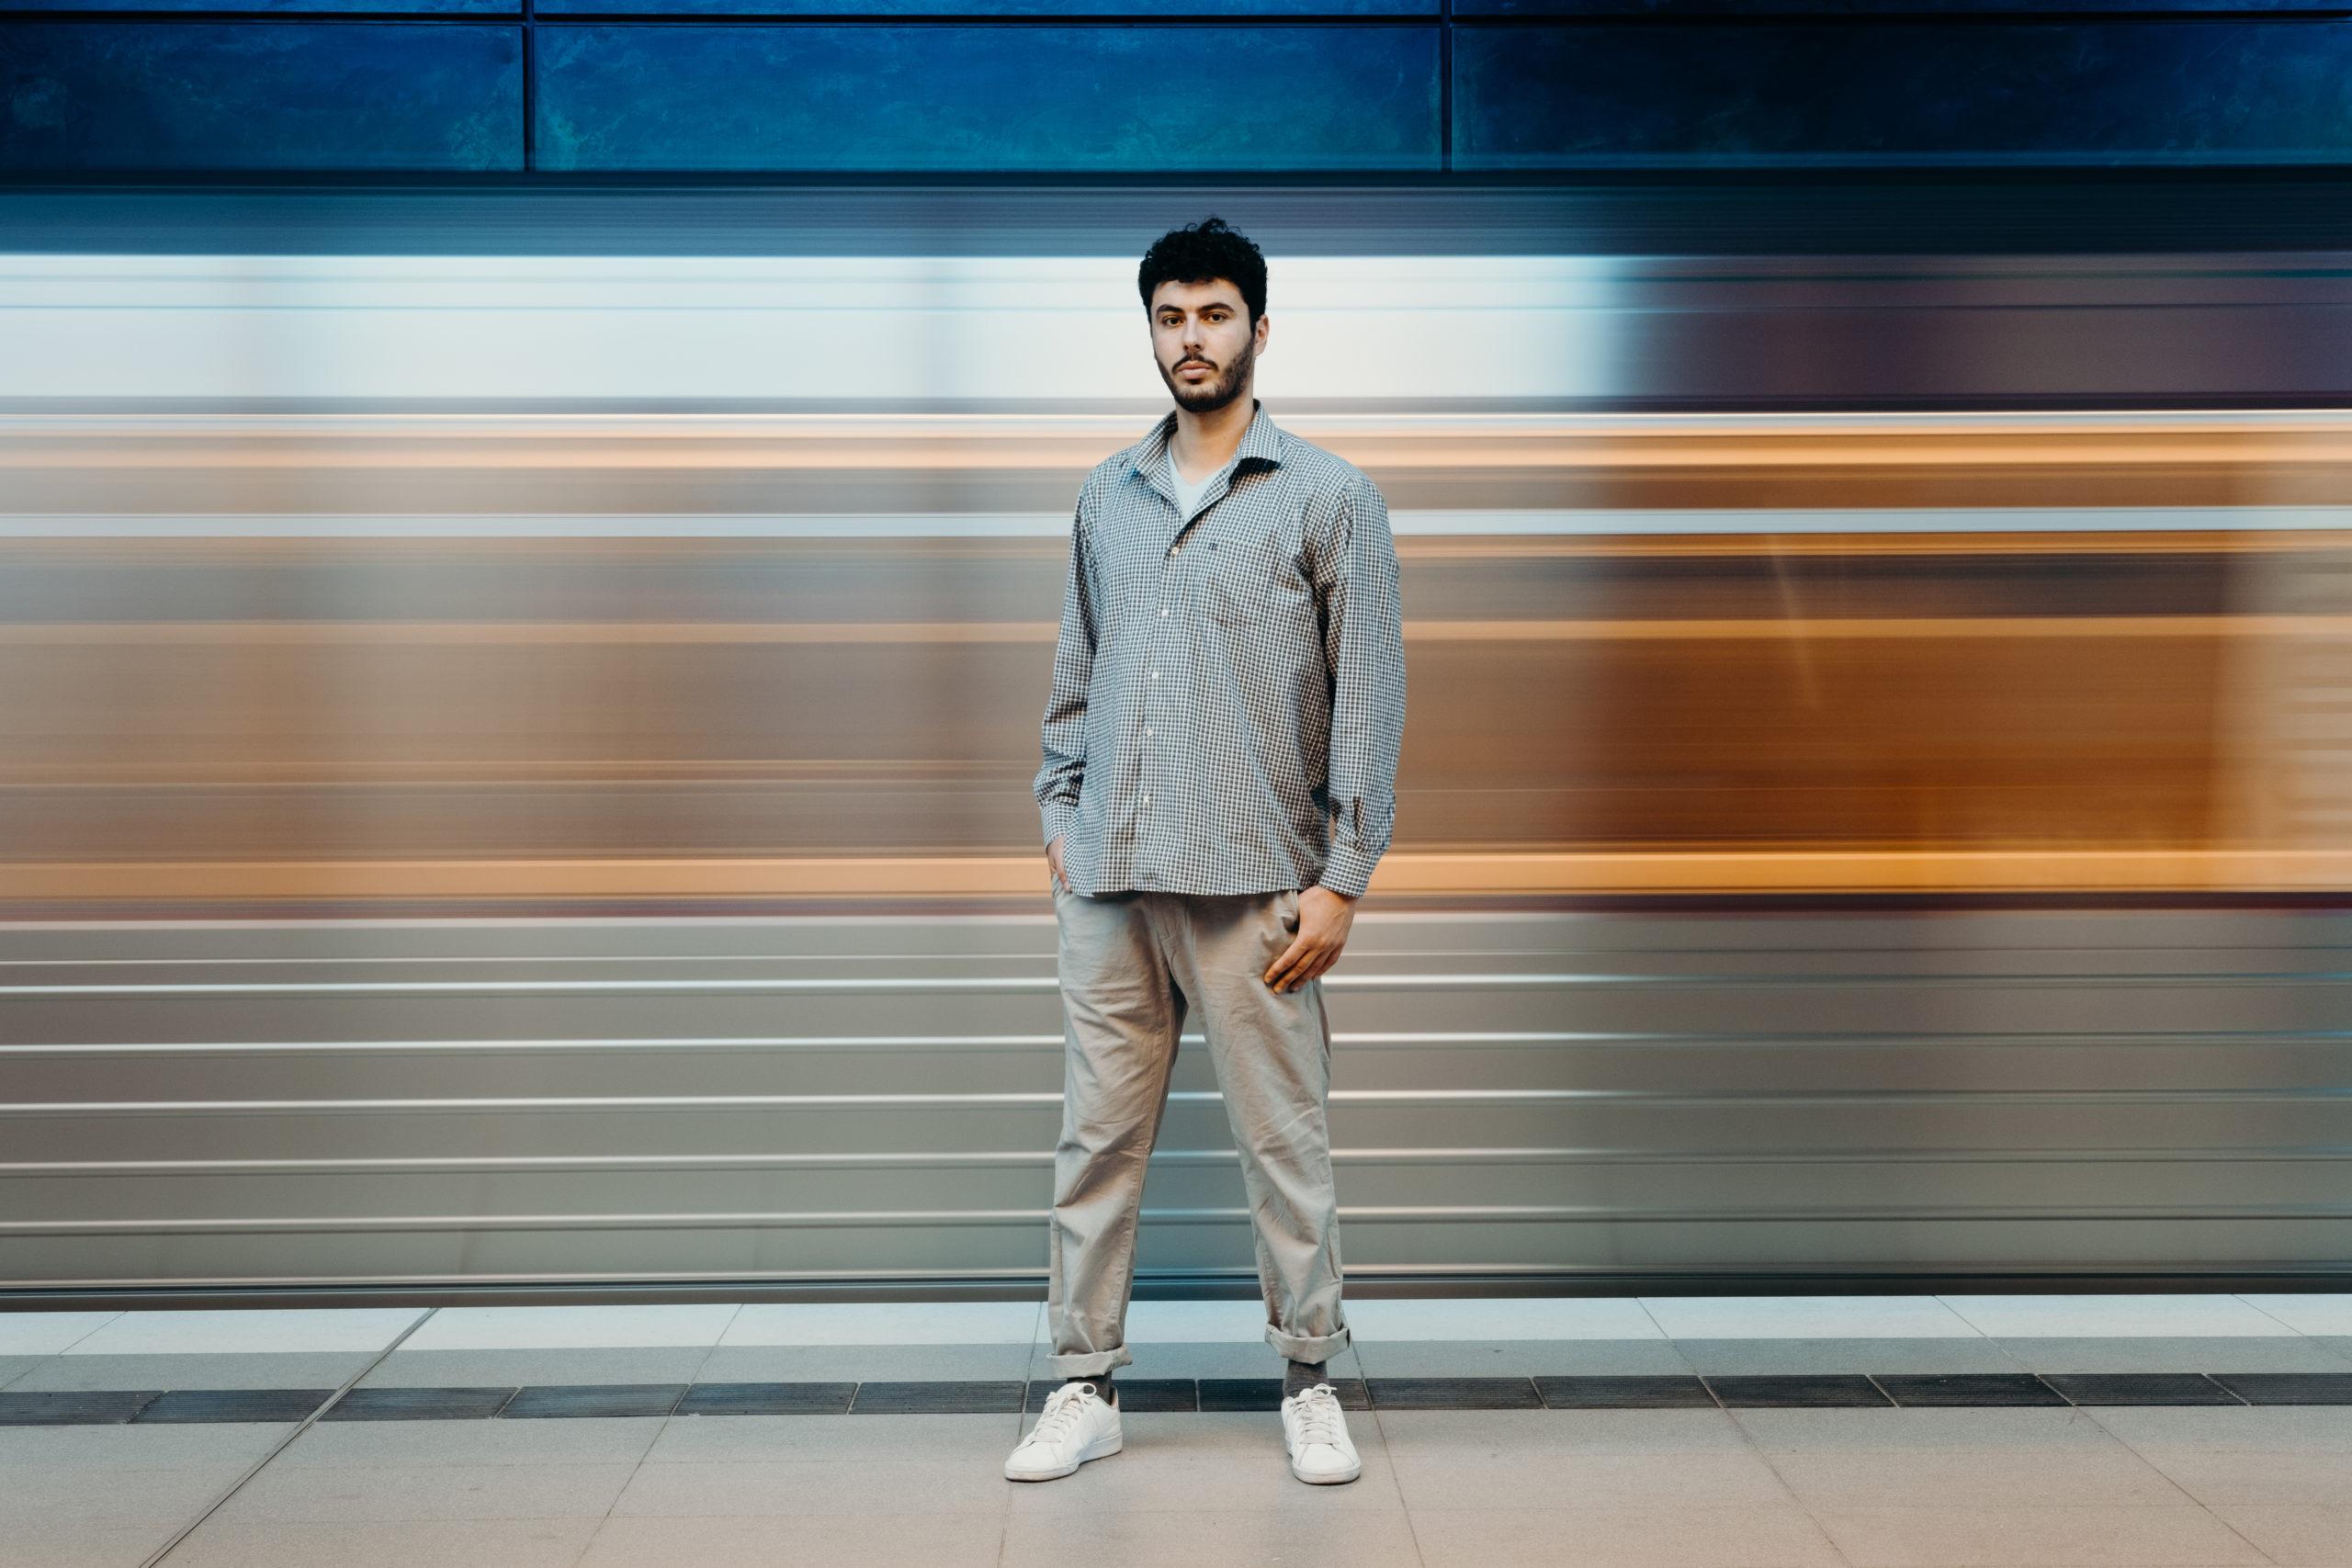 sistart-fotografin-hamburg-fotograf-ammersbek-ubahn-portrait-porträt-schauspieler